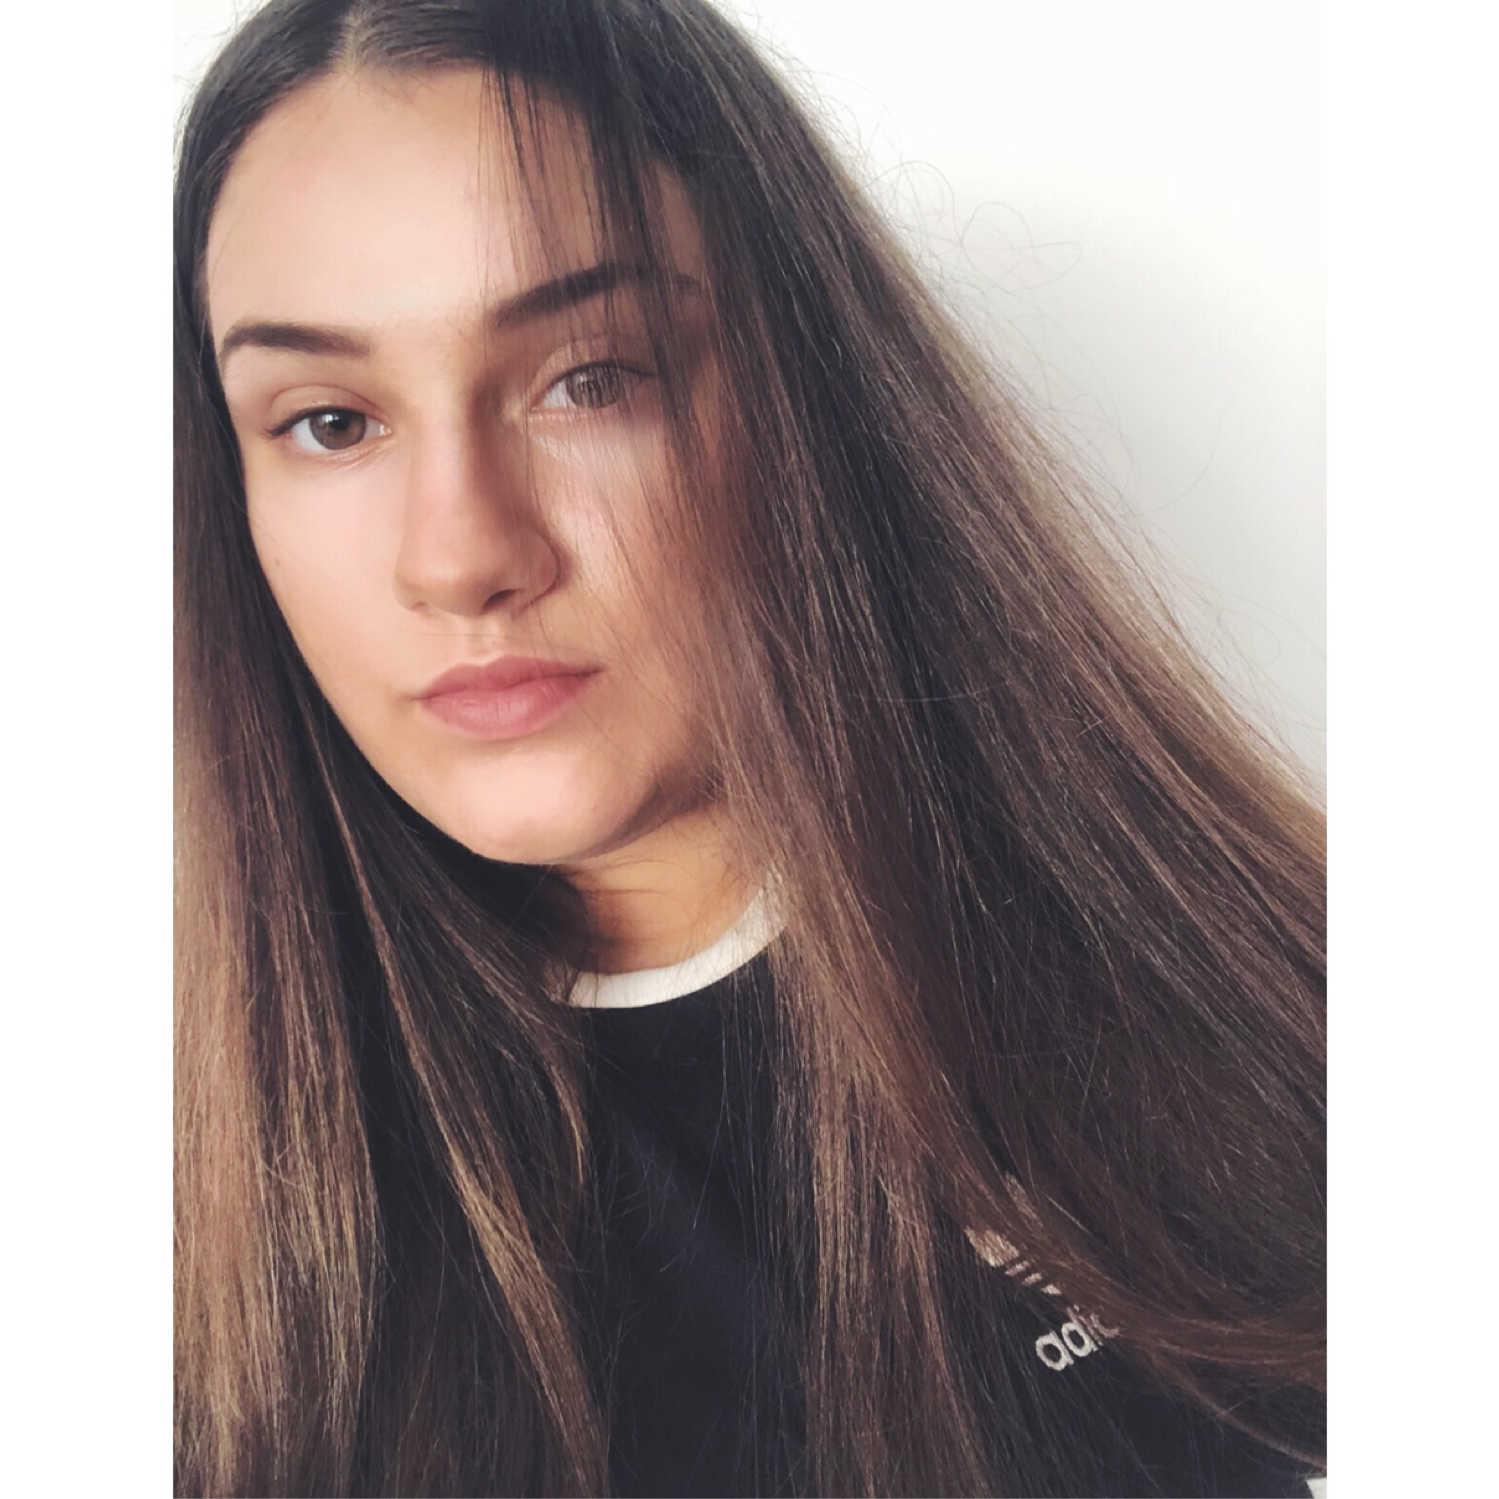 Natalia Bojarczuk